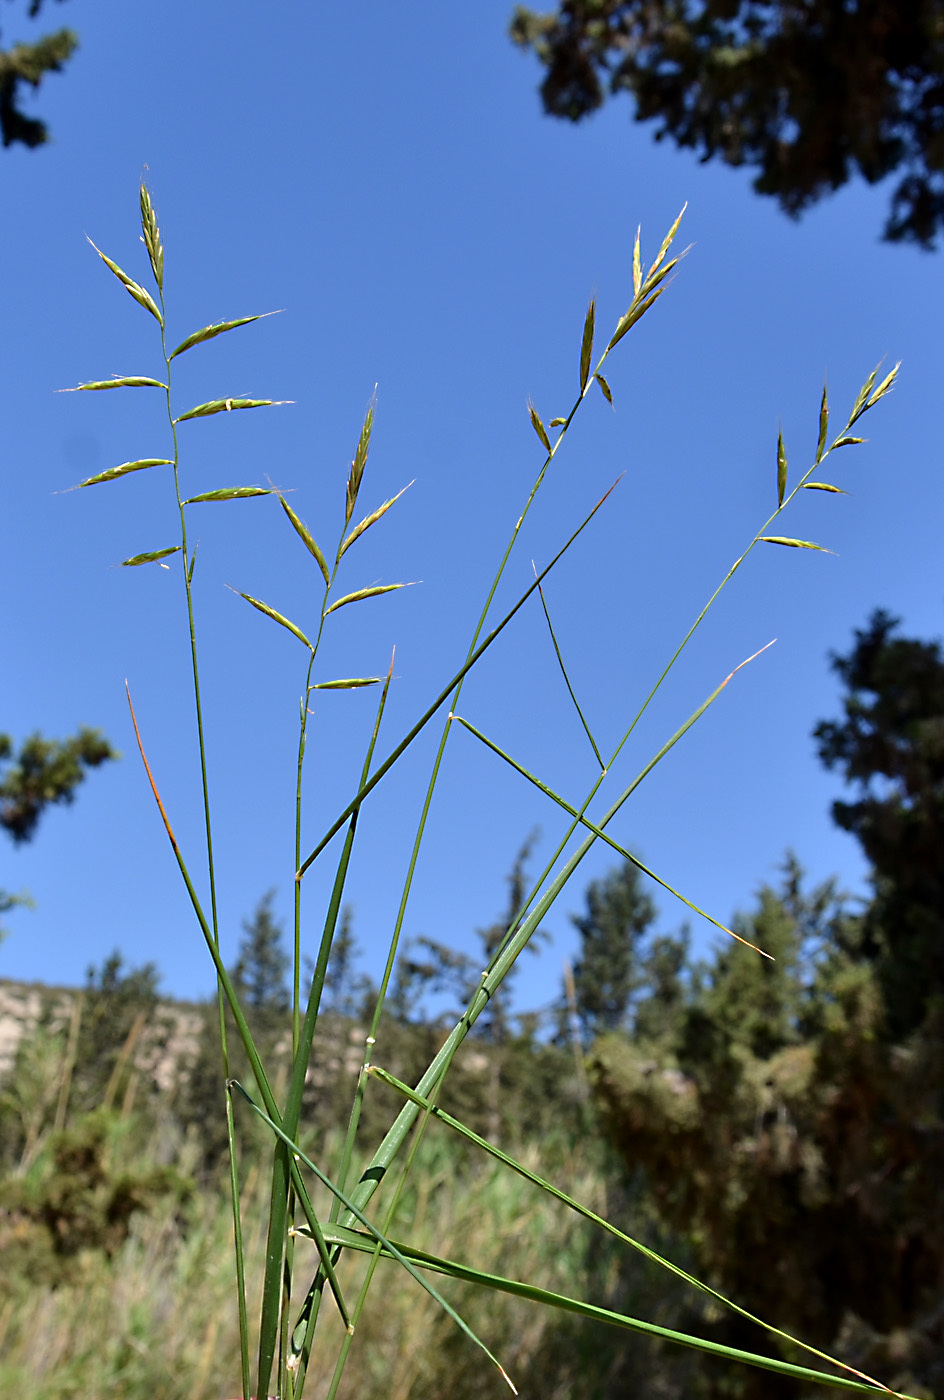 https://pictures.bgbm.org/digilib/Scaler?fn=Cyprus/Brachypodium_pinnatum_B1.jpg&mo=file